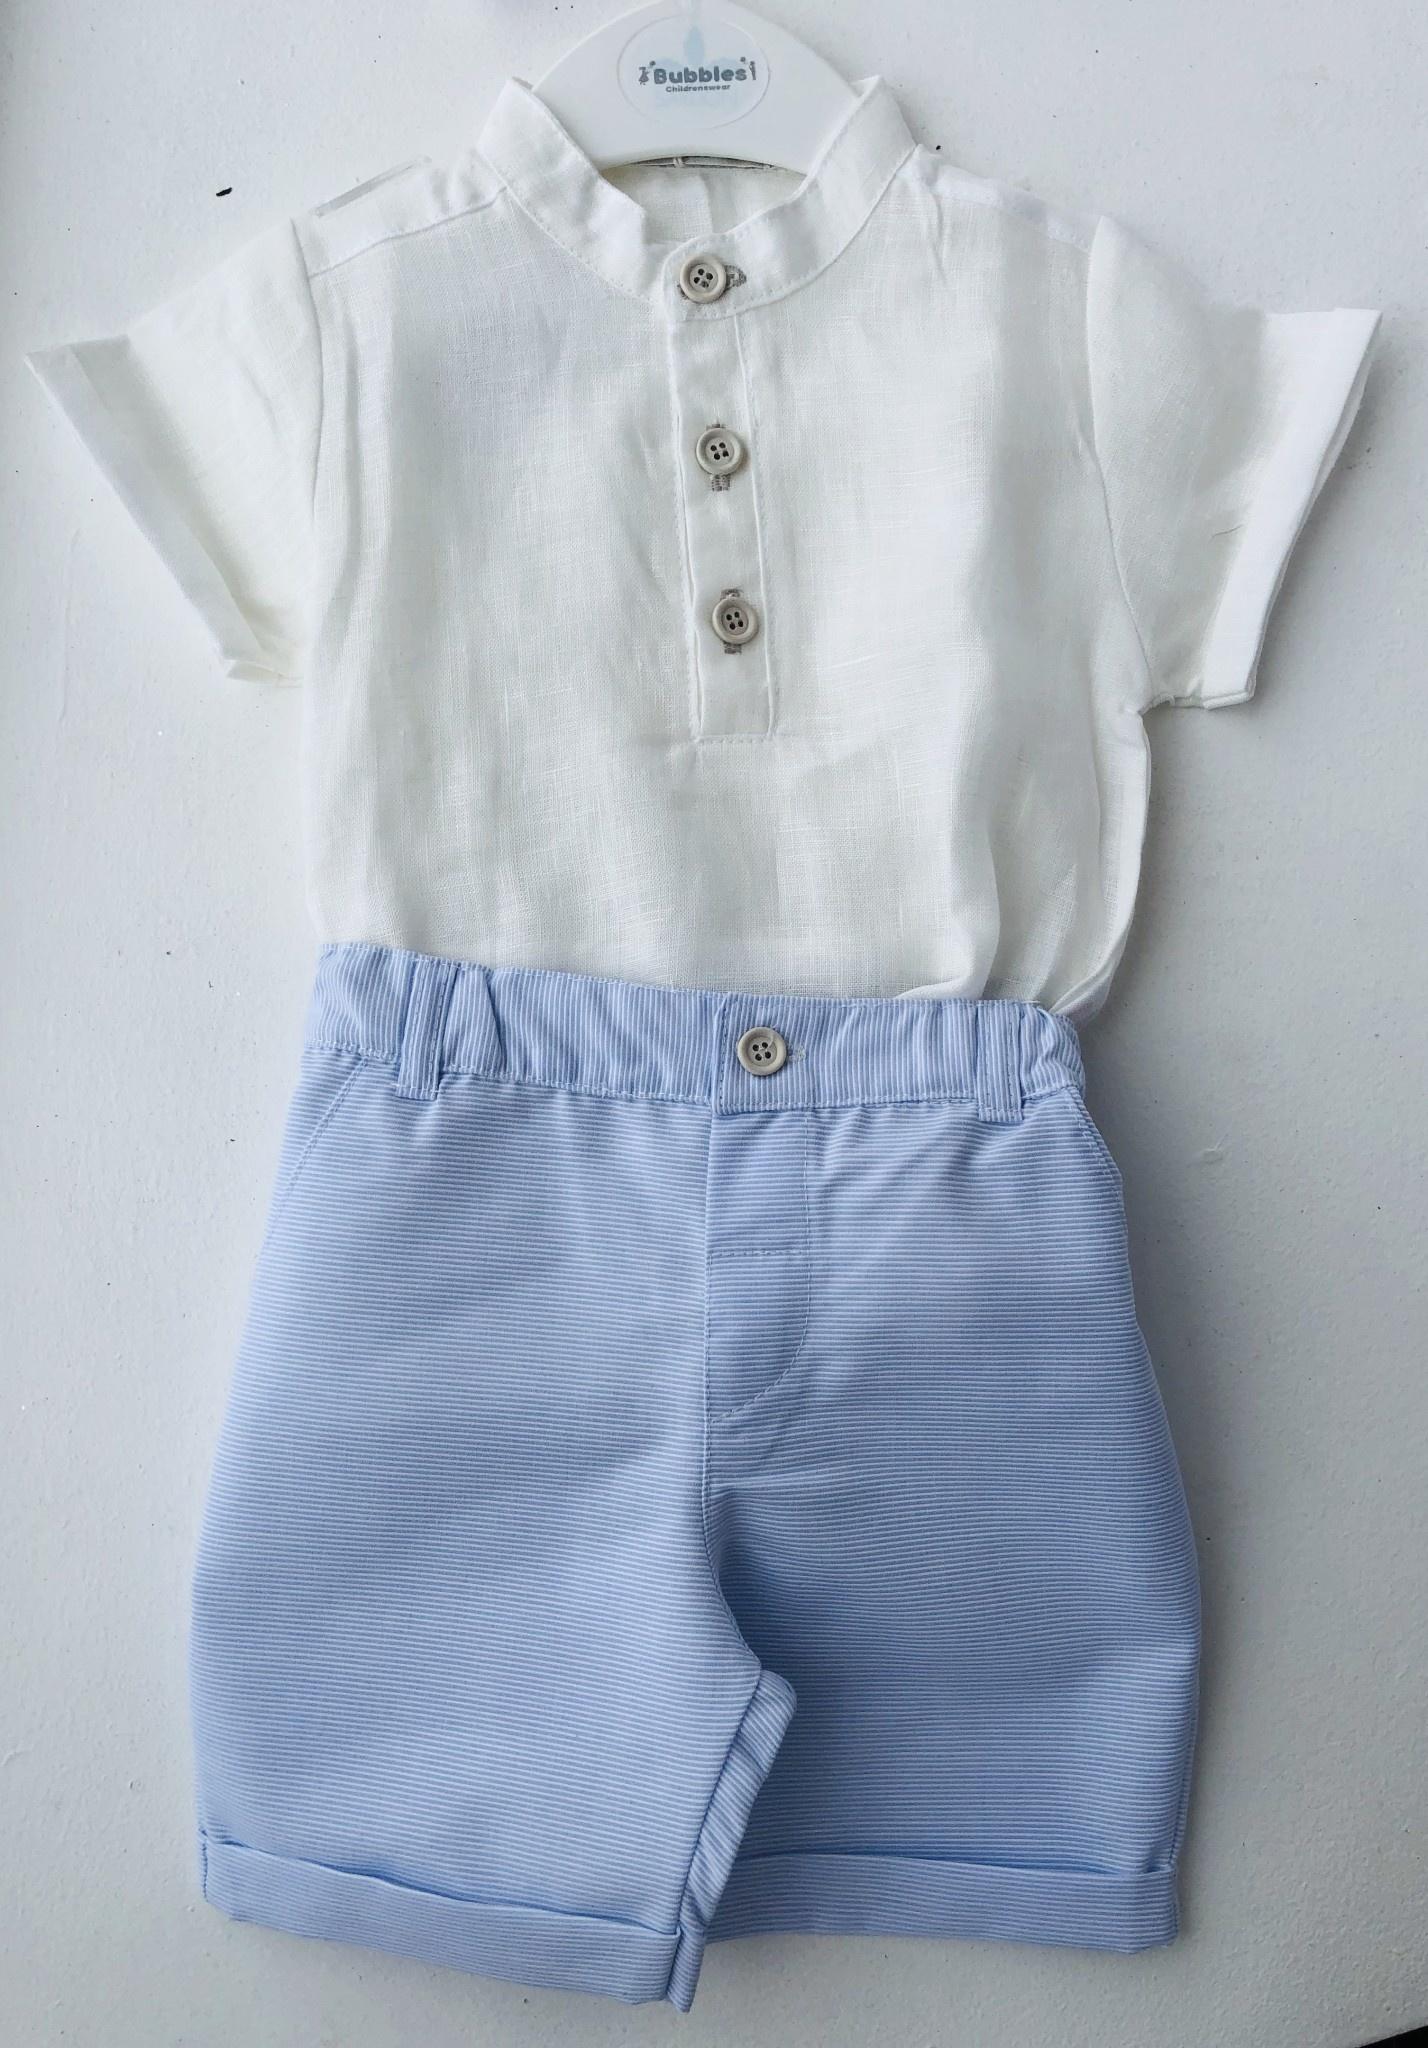 EMC EMC Linen Top and Blue Pin Stripe Shorts Set